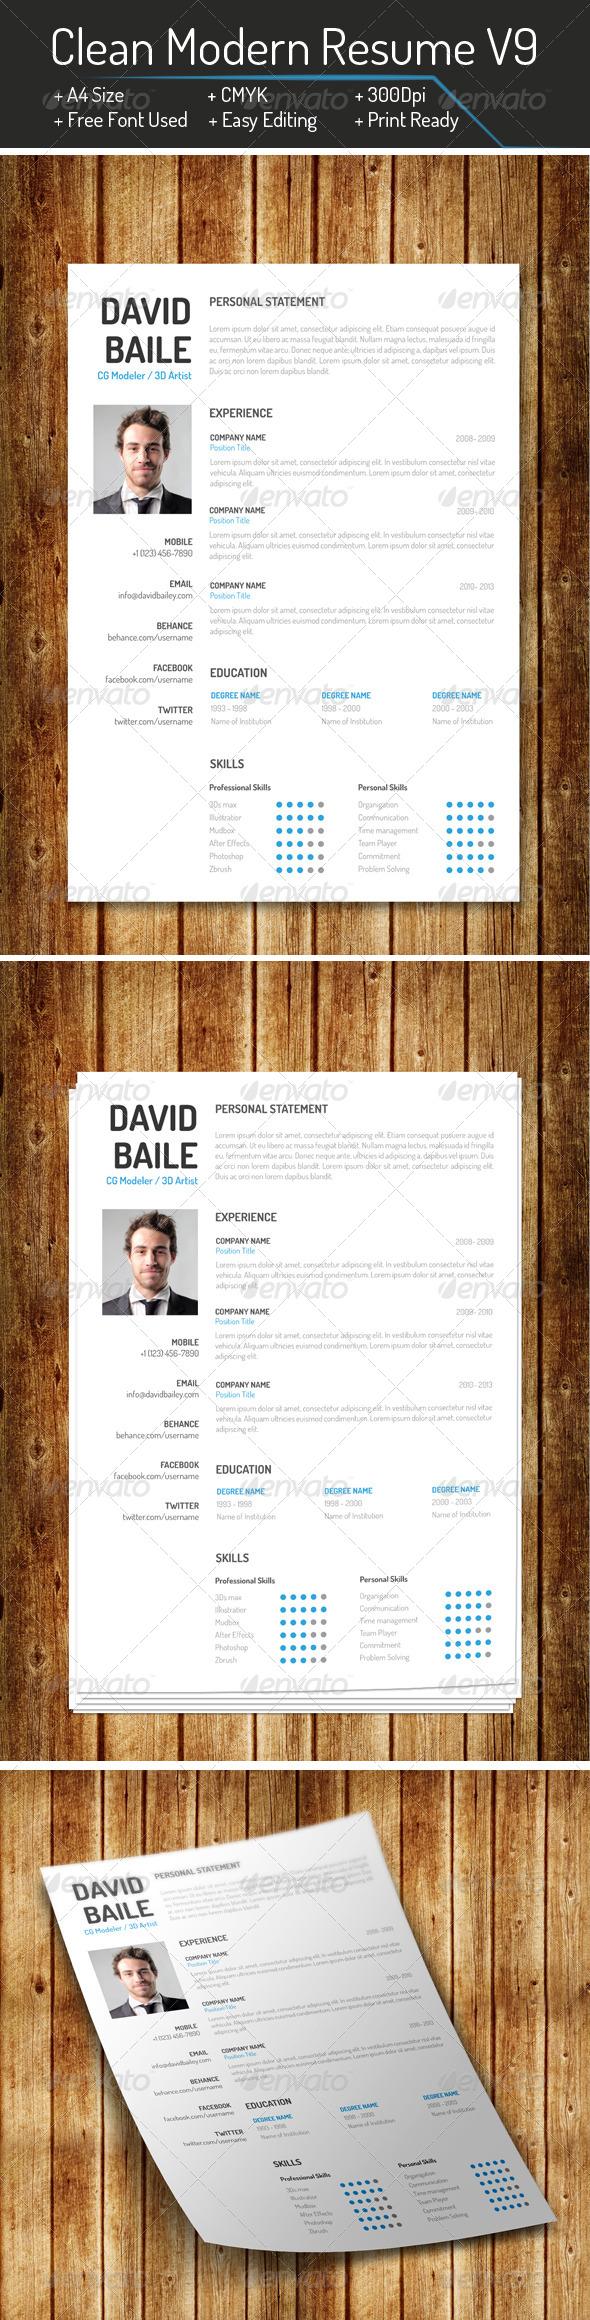 GraphicRiver Clean Modern Resume V9 8163374